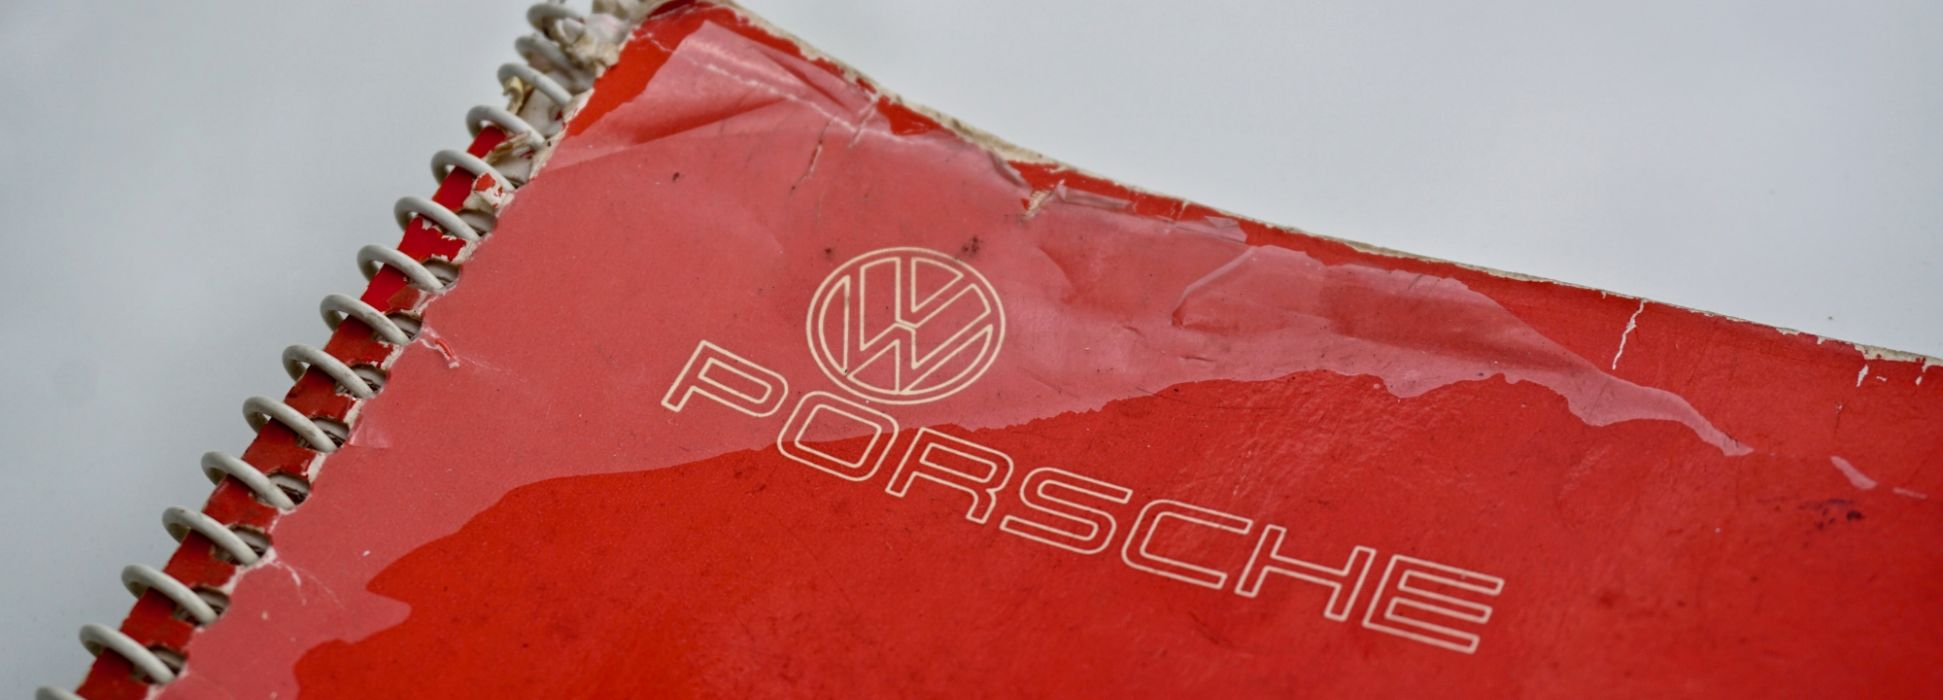 VW-Porsche 914 2.0 / 47 9